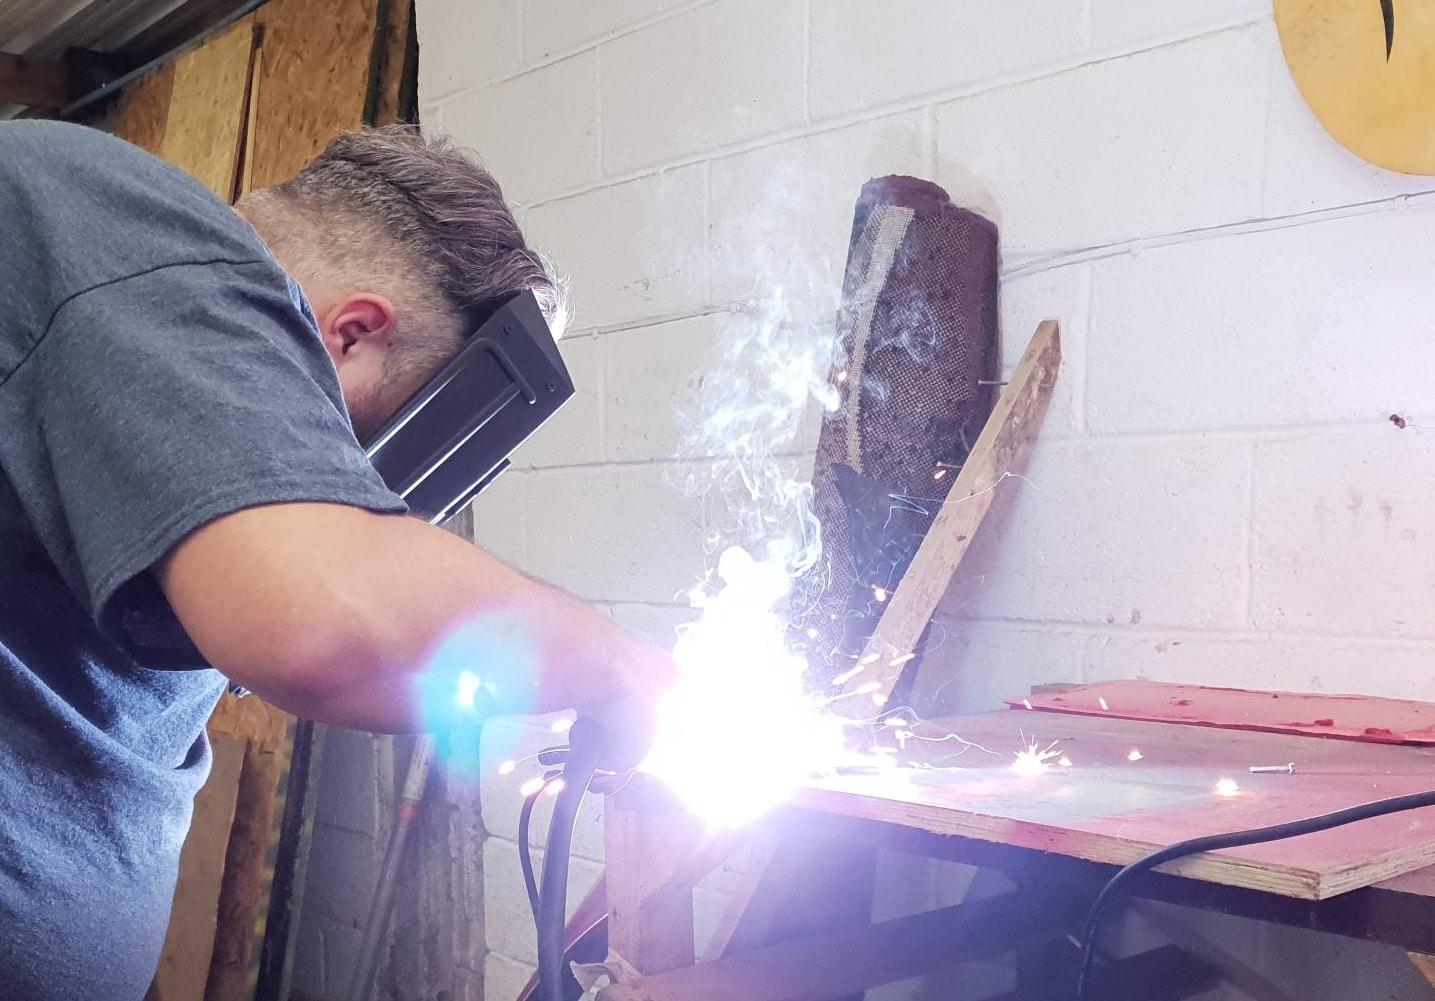 Sealey Mightymig90, Sealey, Mightymig,Mightymig90, welder, mig welding, gasless mig, gasless welding, car restoration, motoring, automotive, car, cars, classic car, retro car, ebay, not2grand, www.not2grand.co.uk, adrian flux, featured, motoring, automotive